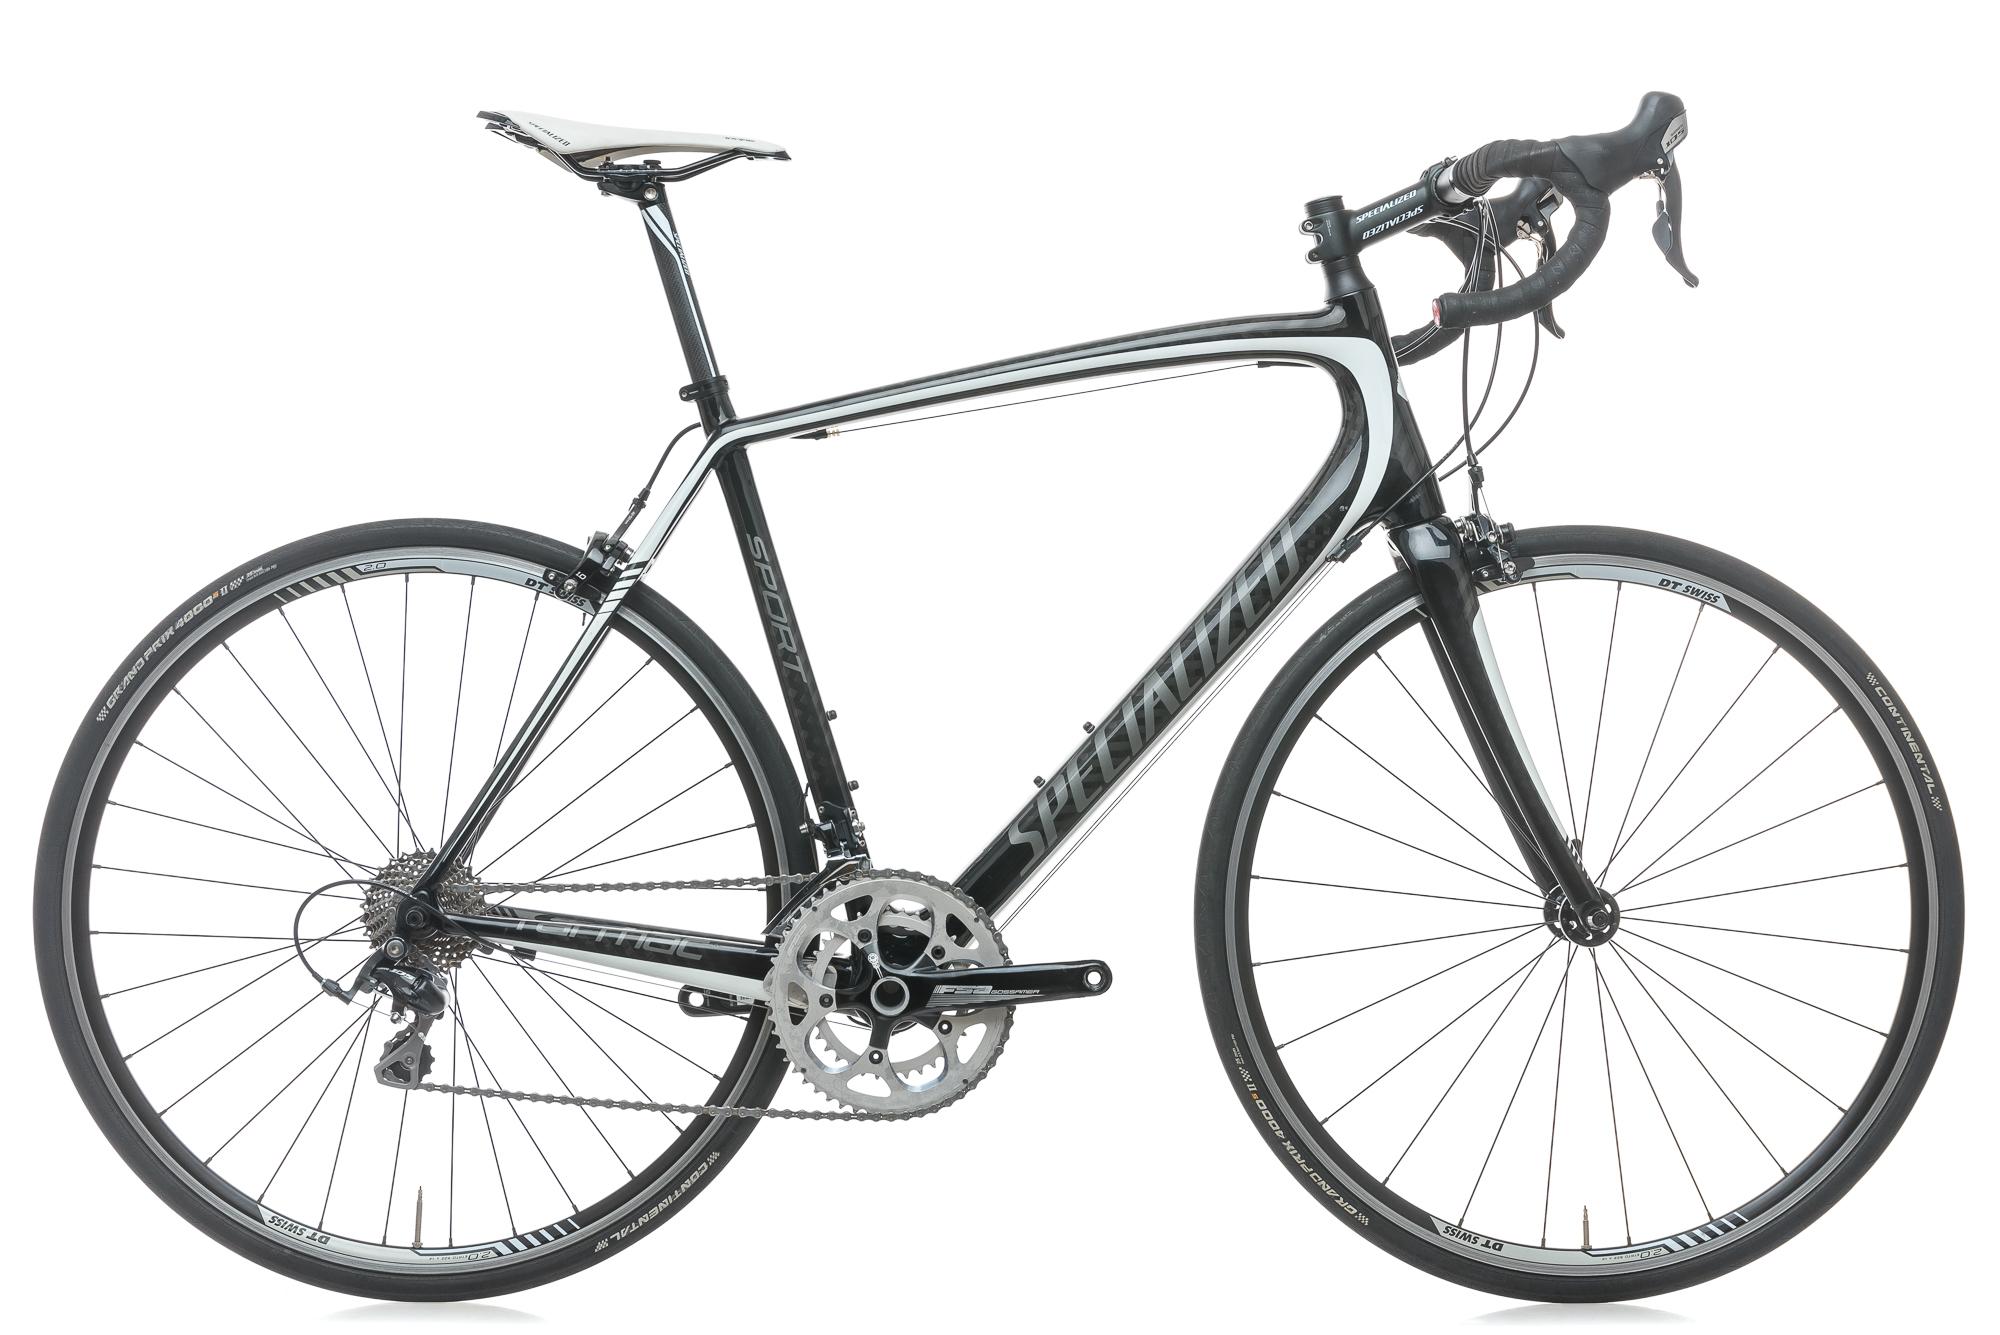 2013 Specialized Tarmac Sport Road Bike 58cm Carbon Shimano 105 10 Speed